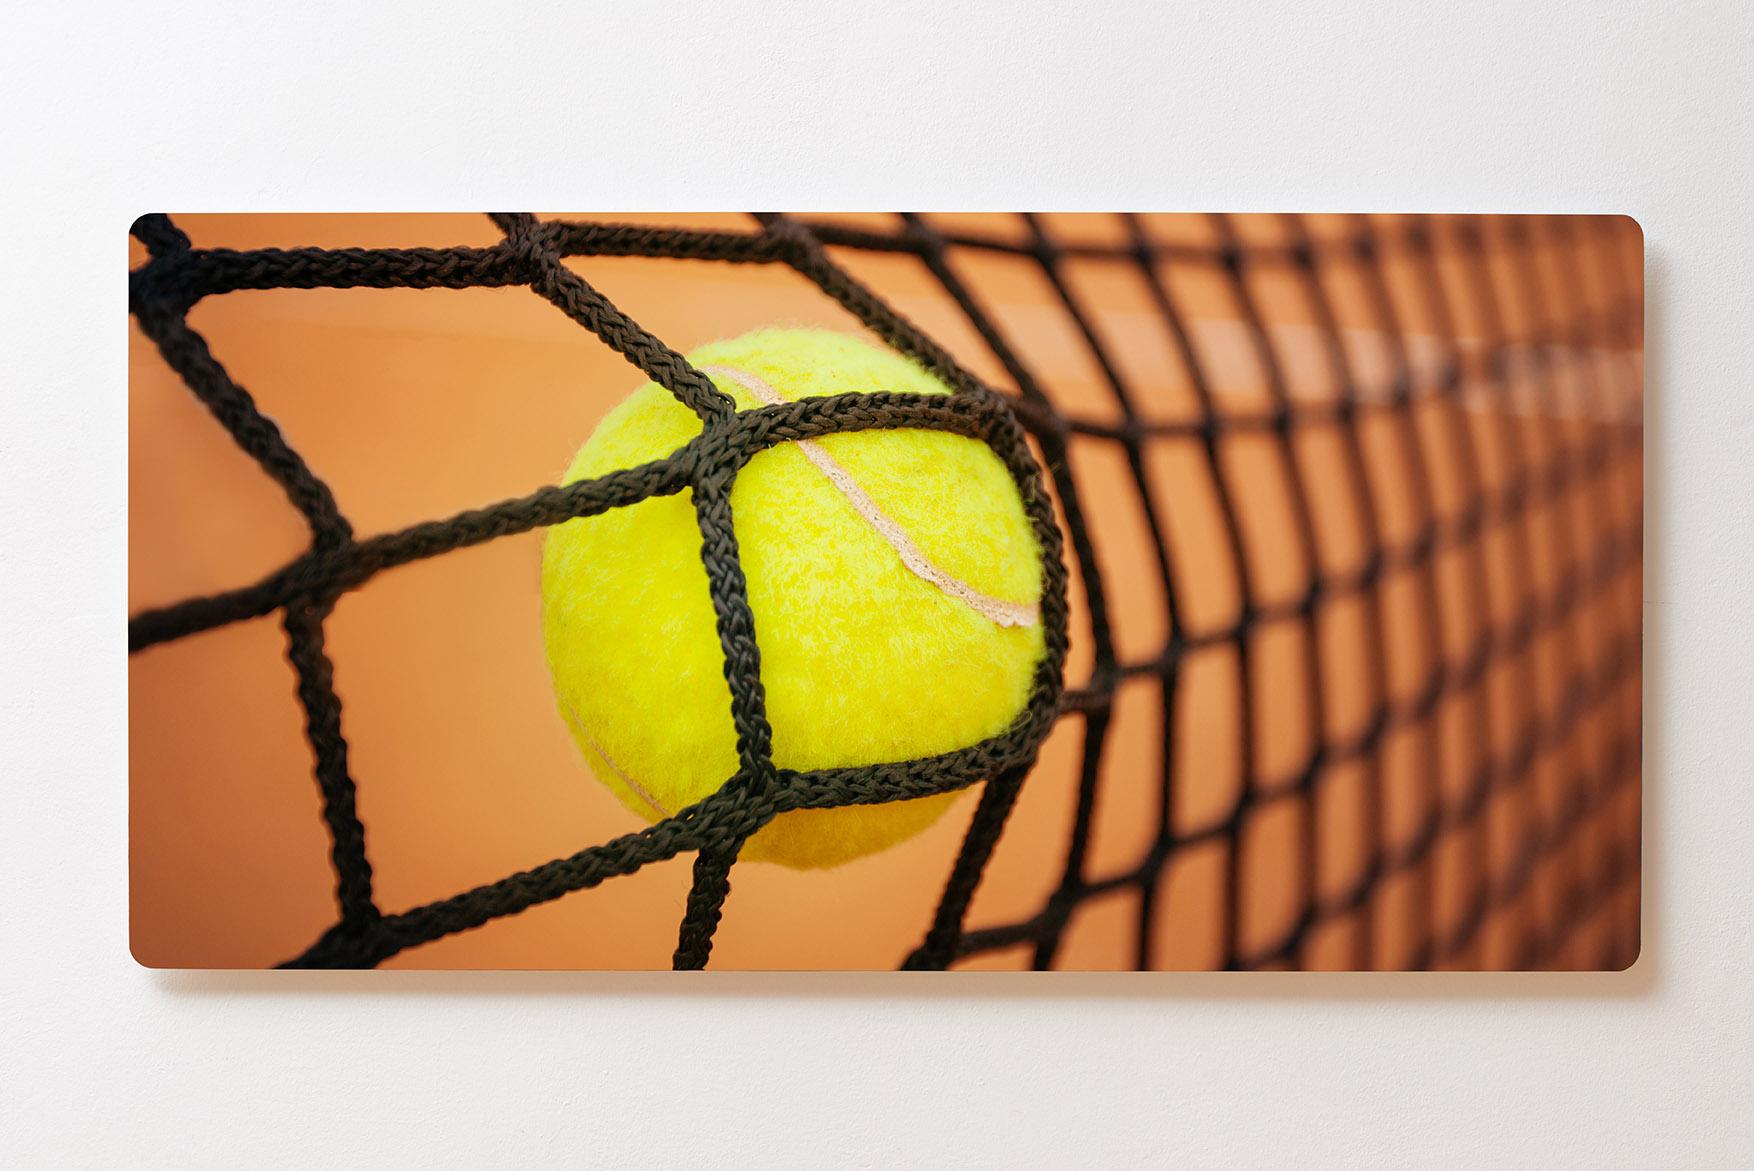 Magnettafel BACKLIGHT 120x60cm Motiv-Wandbild M138 Tennis Tennisball